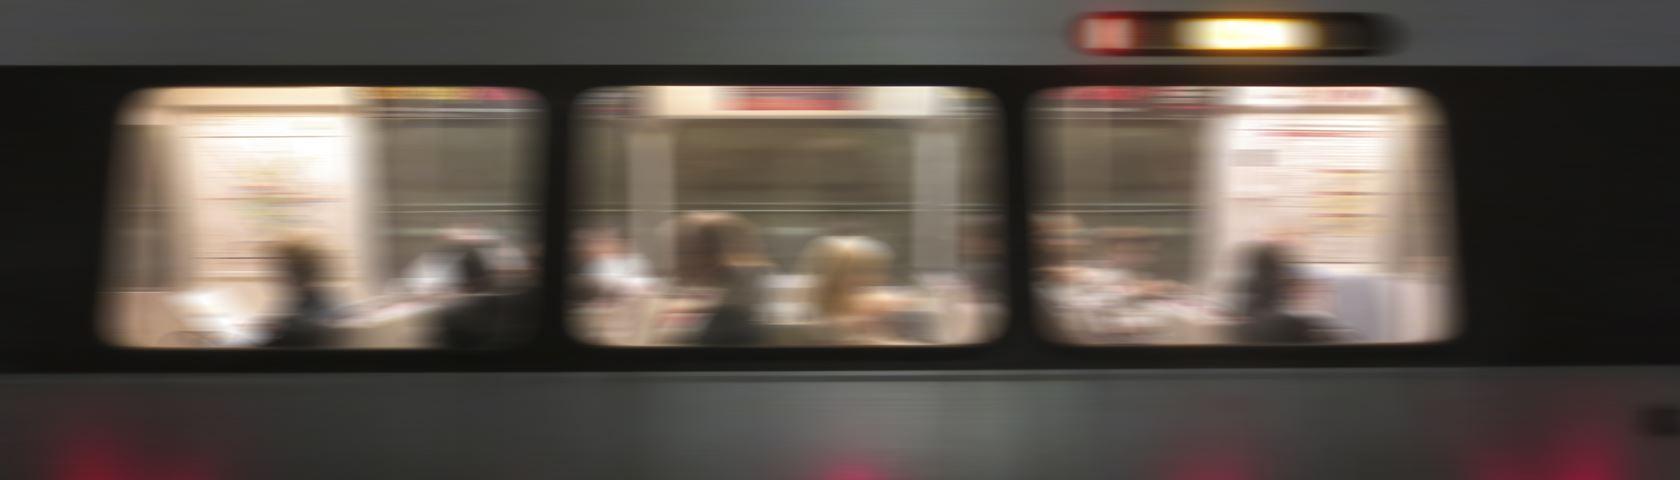 Metro Train Speeding Away